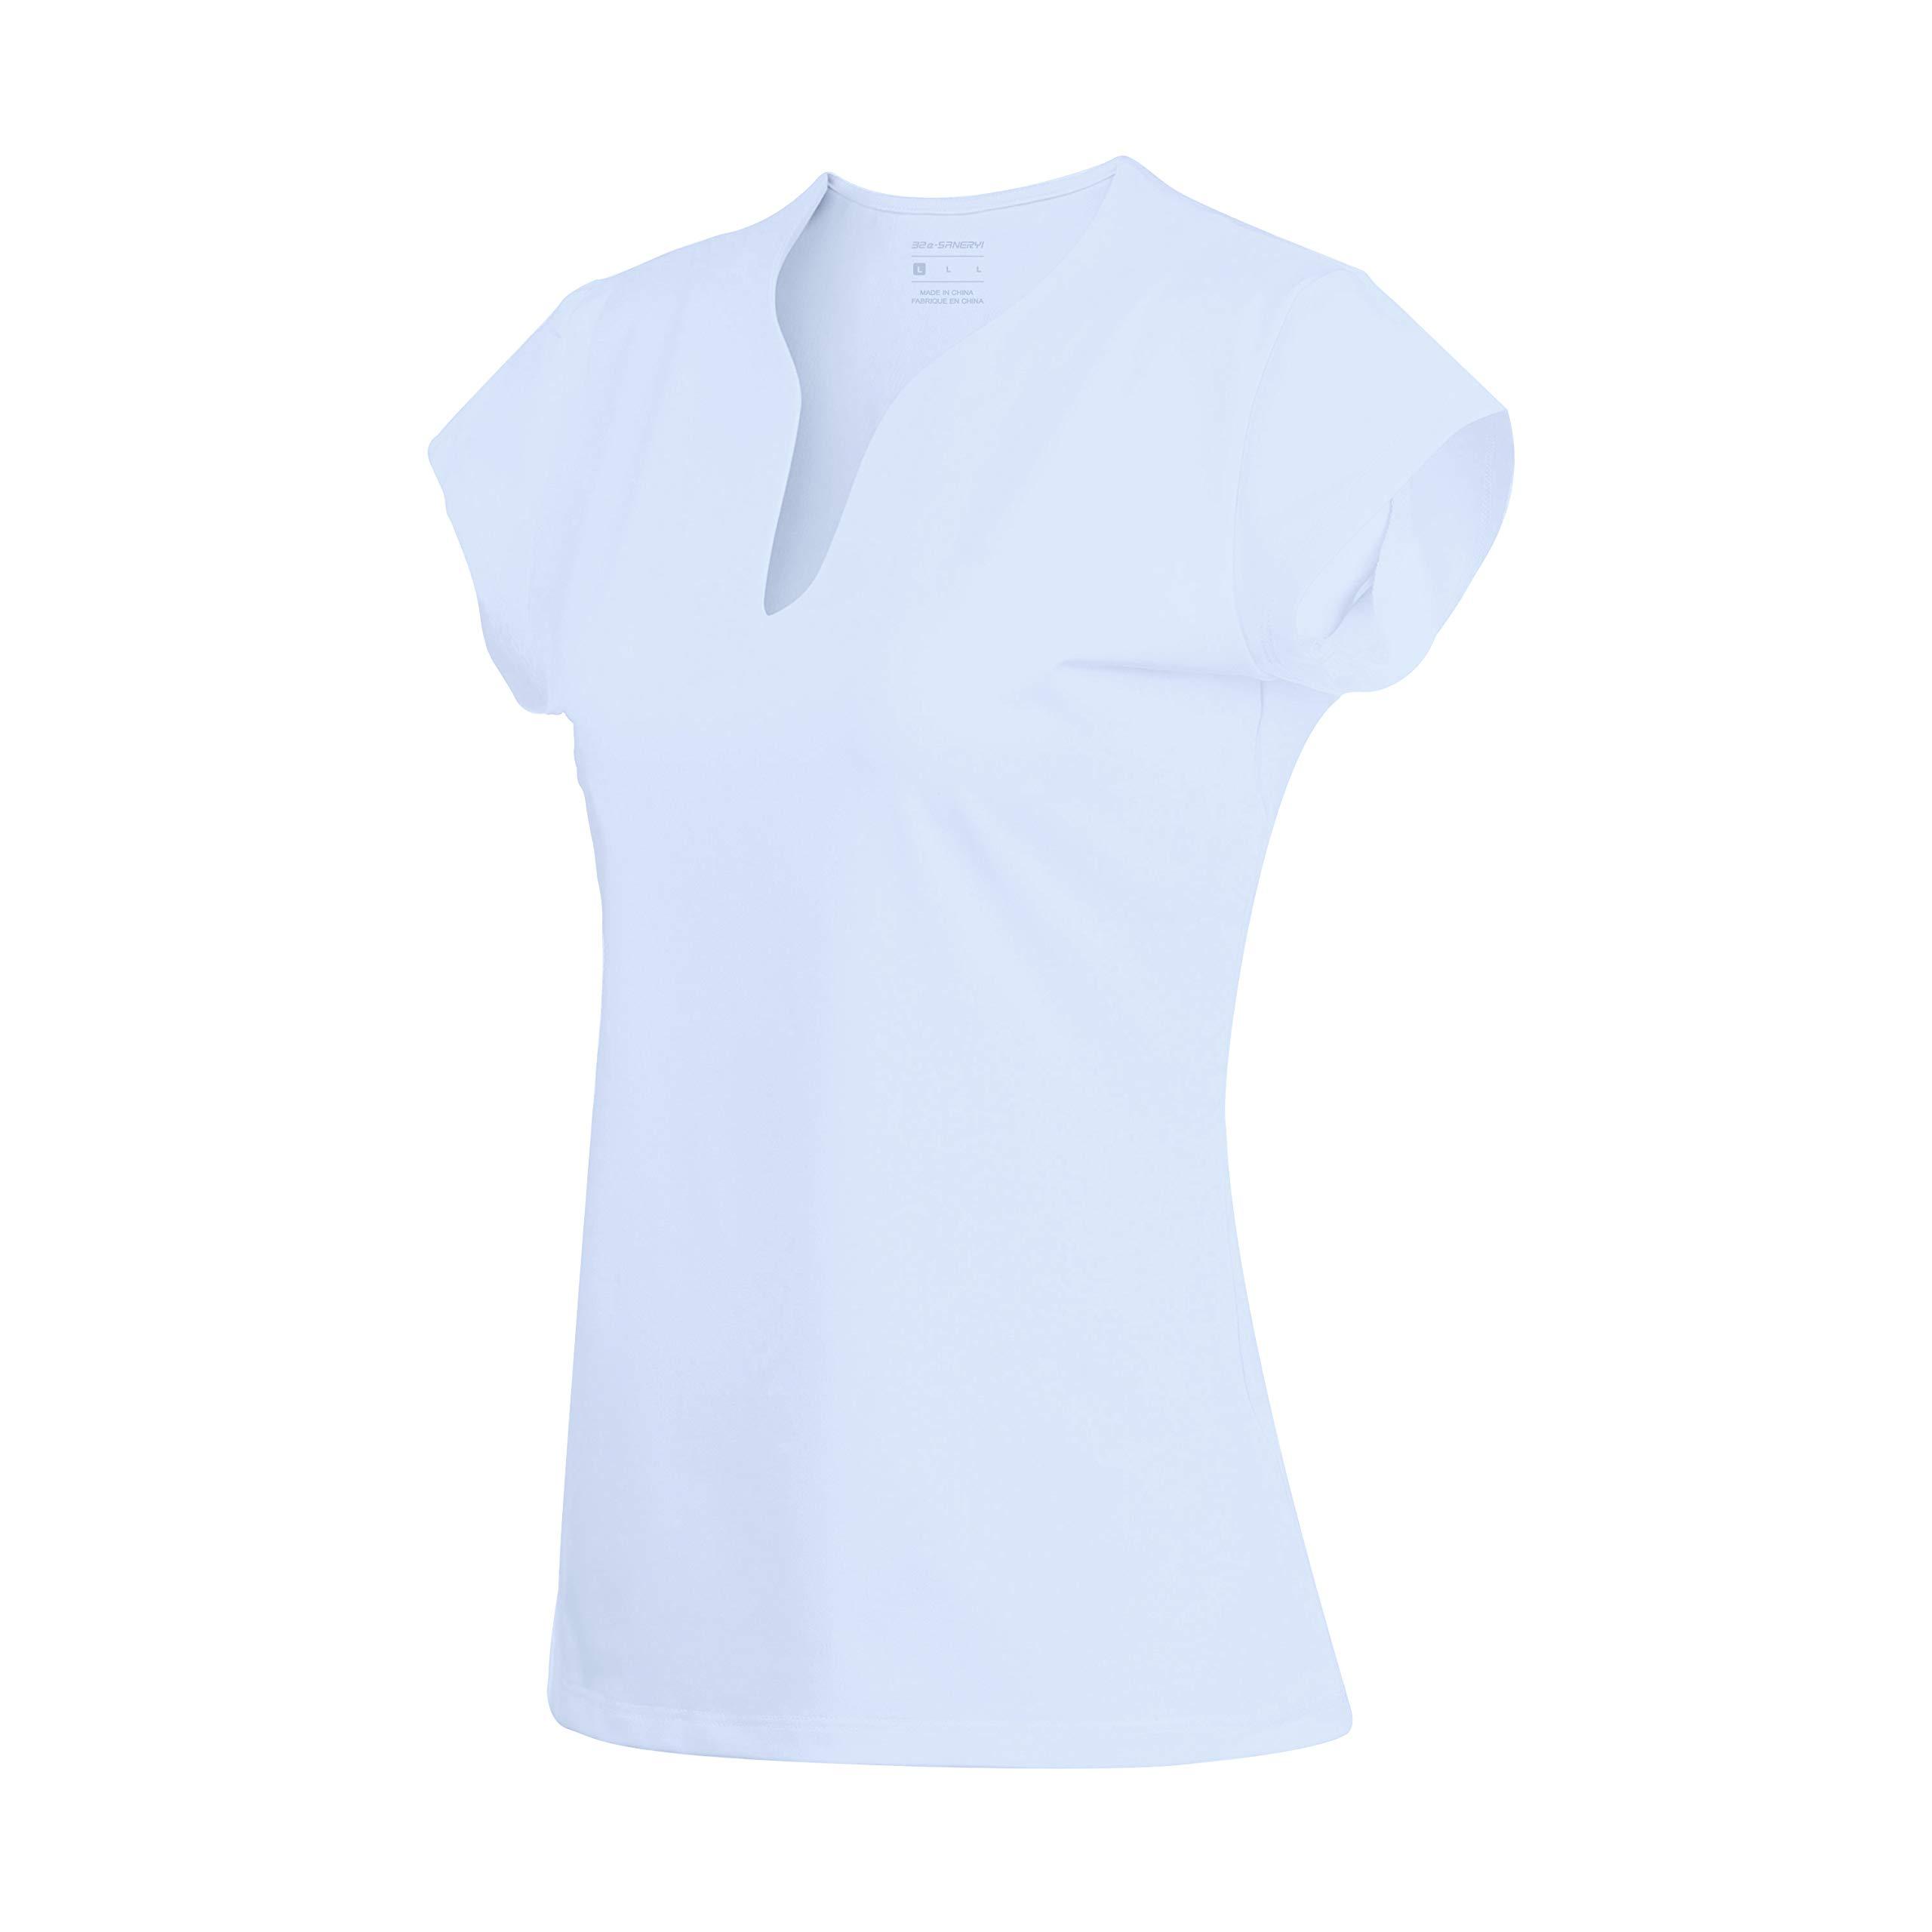 32e-SANERYI Women's V-Neck Pullover Short Sleeve Sports Shirts Quick-Drying Tees (S, Light Blue)